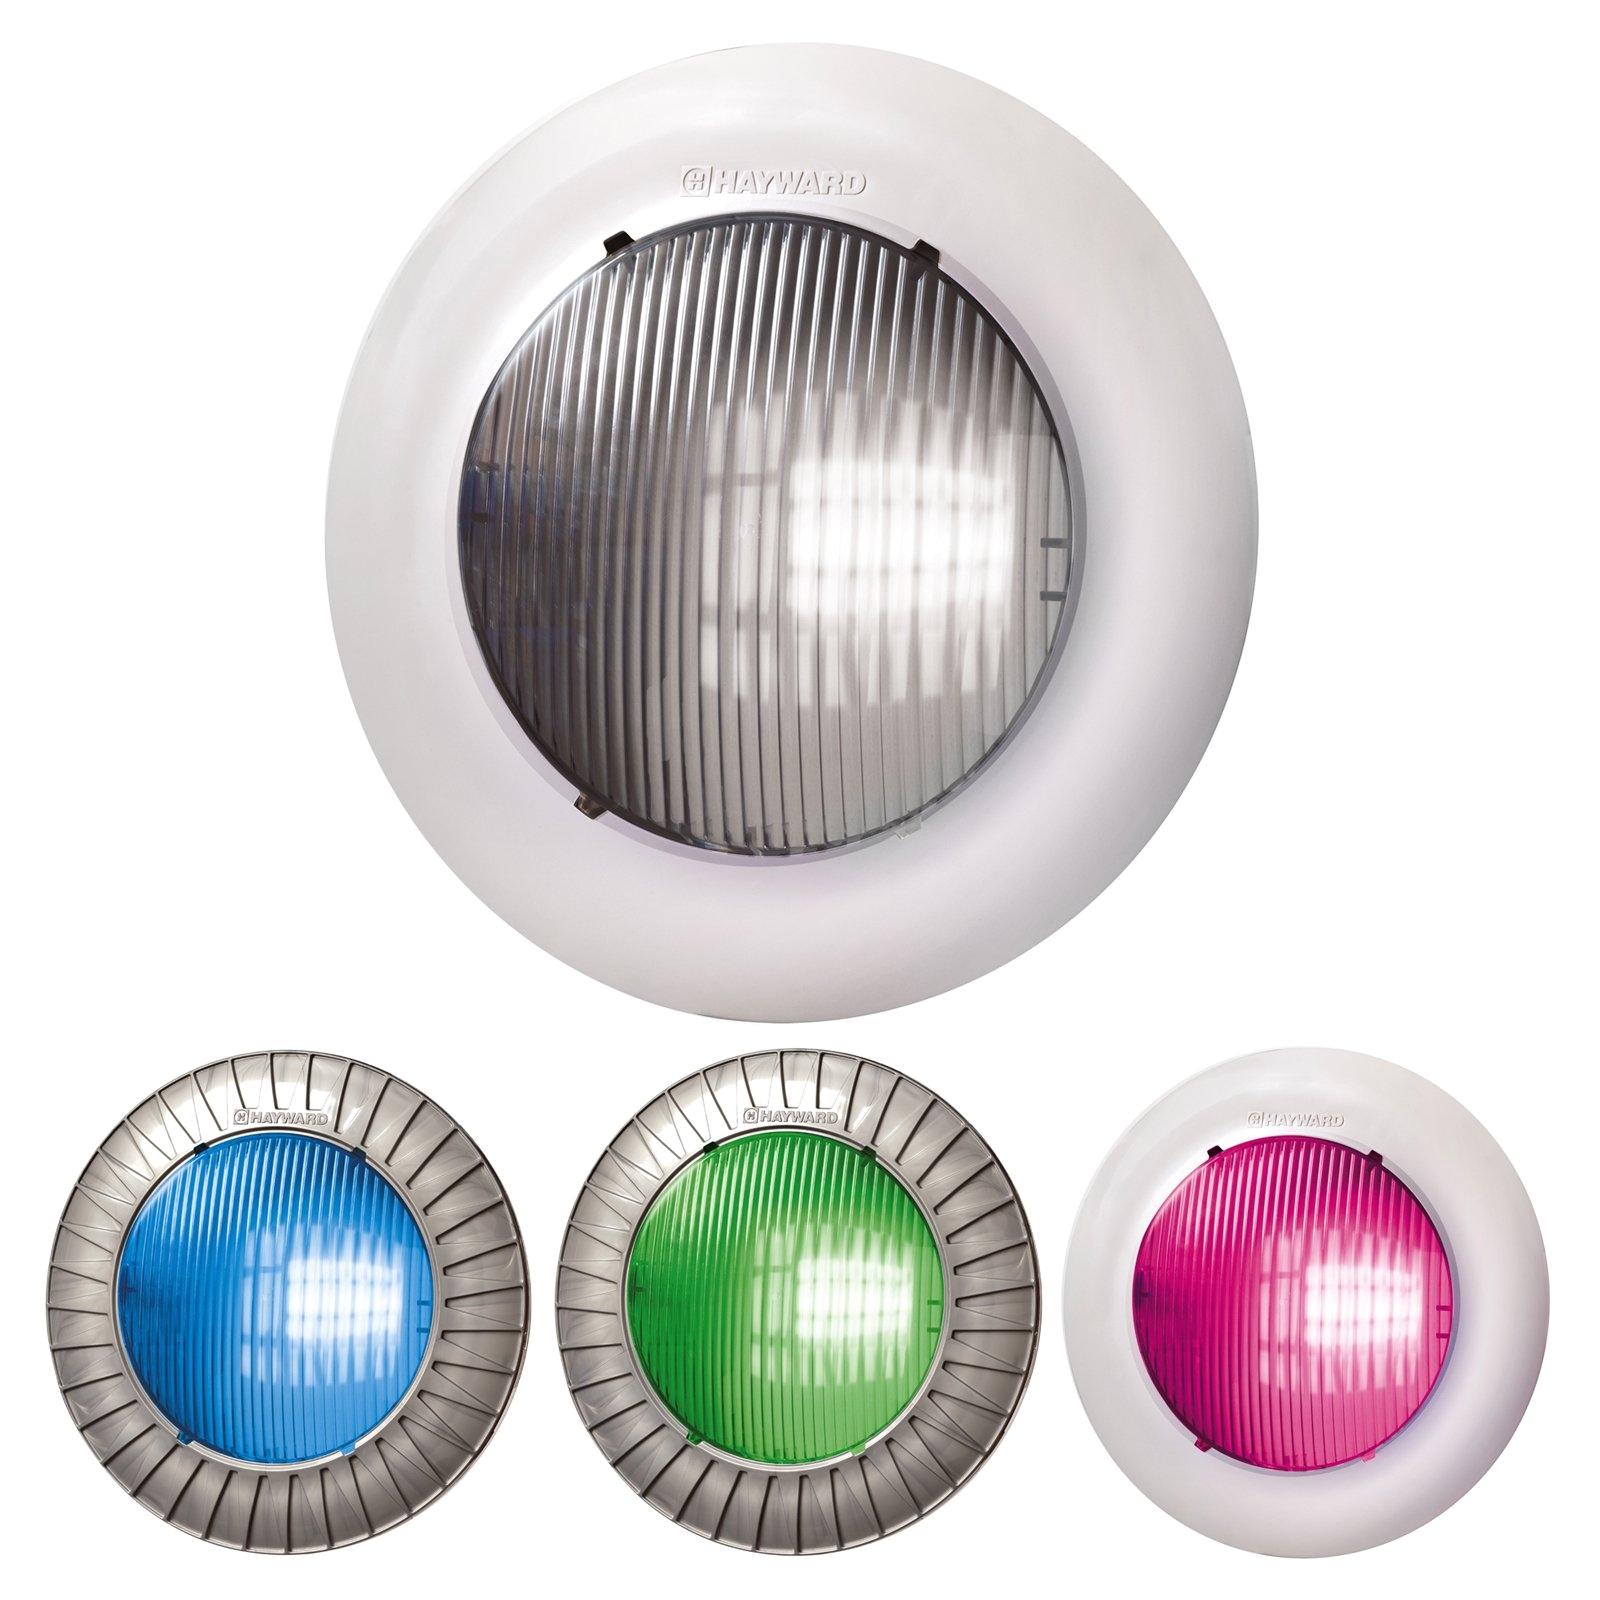 hayward universal colorlogic led pool light lpcus11100